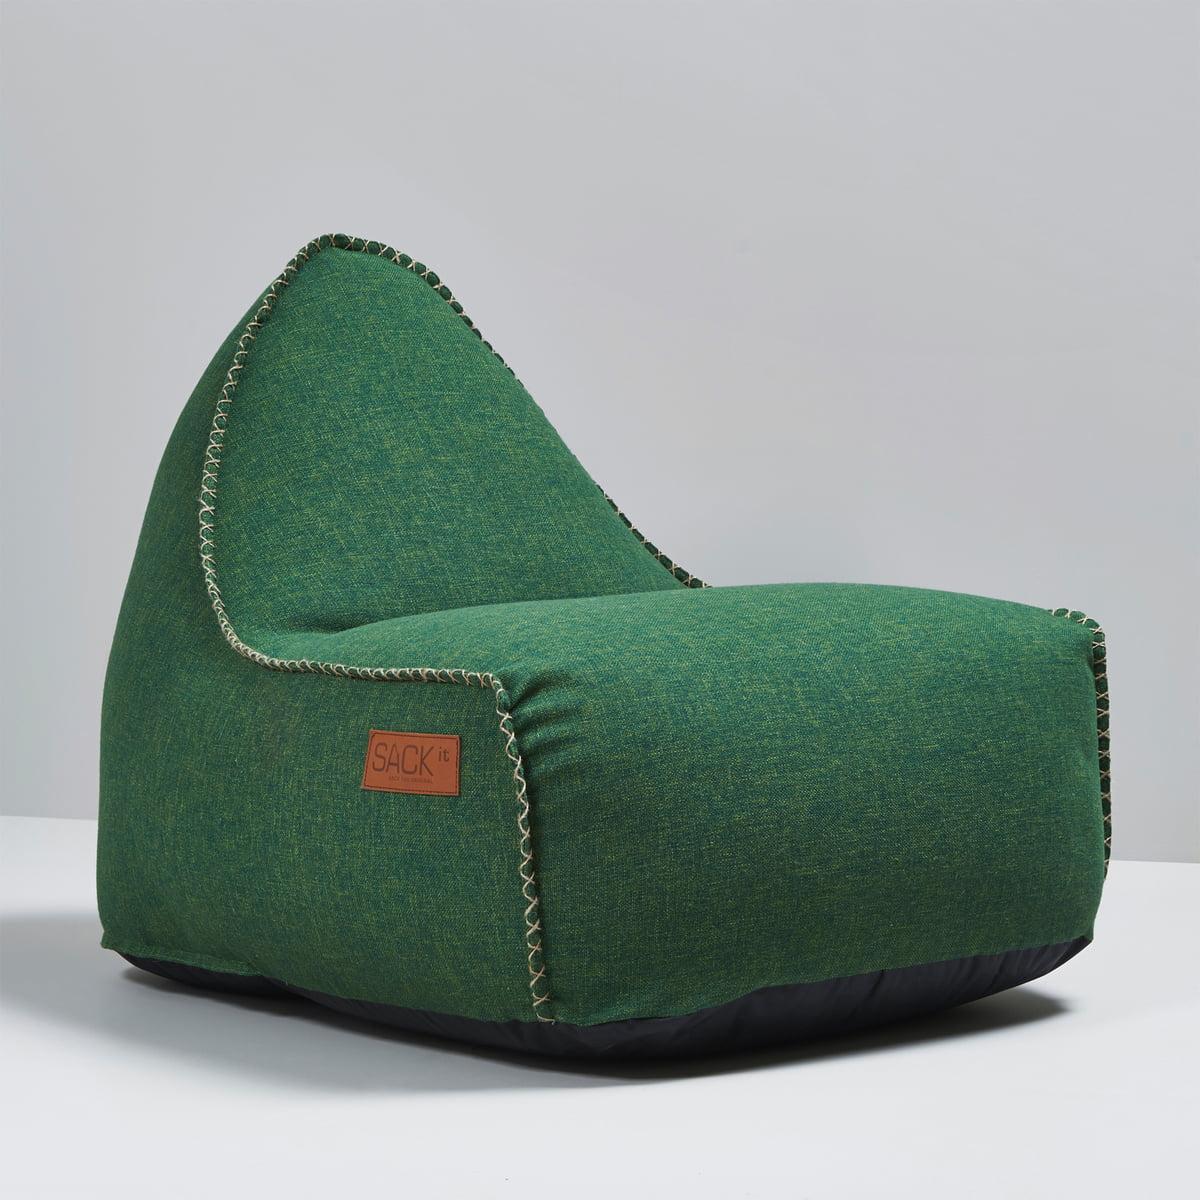 retro it outdoor sitzsack von sack it. Black Bedroom Furniture Sets. Home Design Ideas